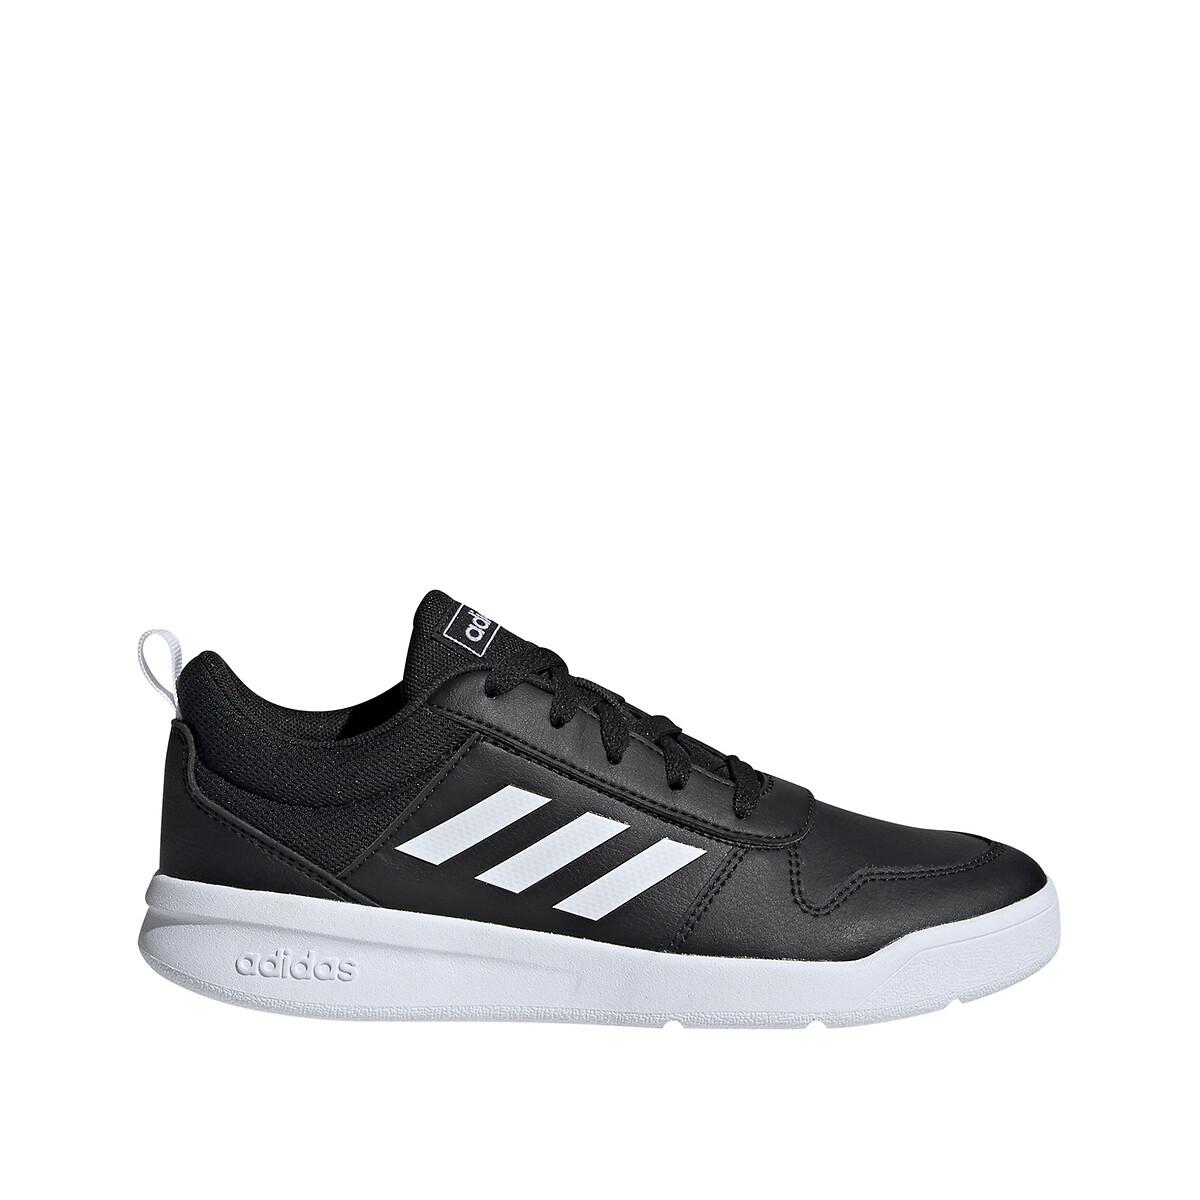 Adidas Performance Tensaur K sportschoenen zwart/wit kids online kopen